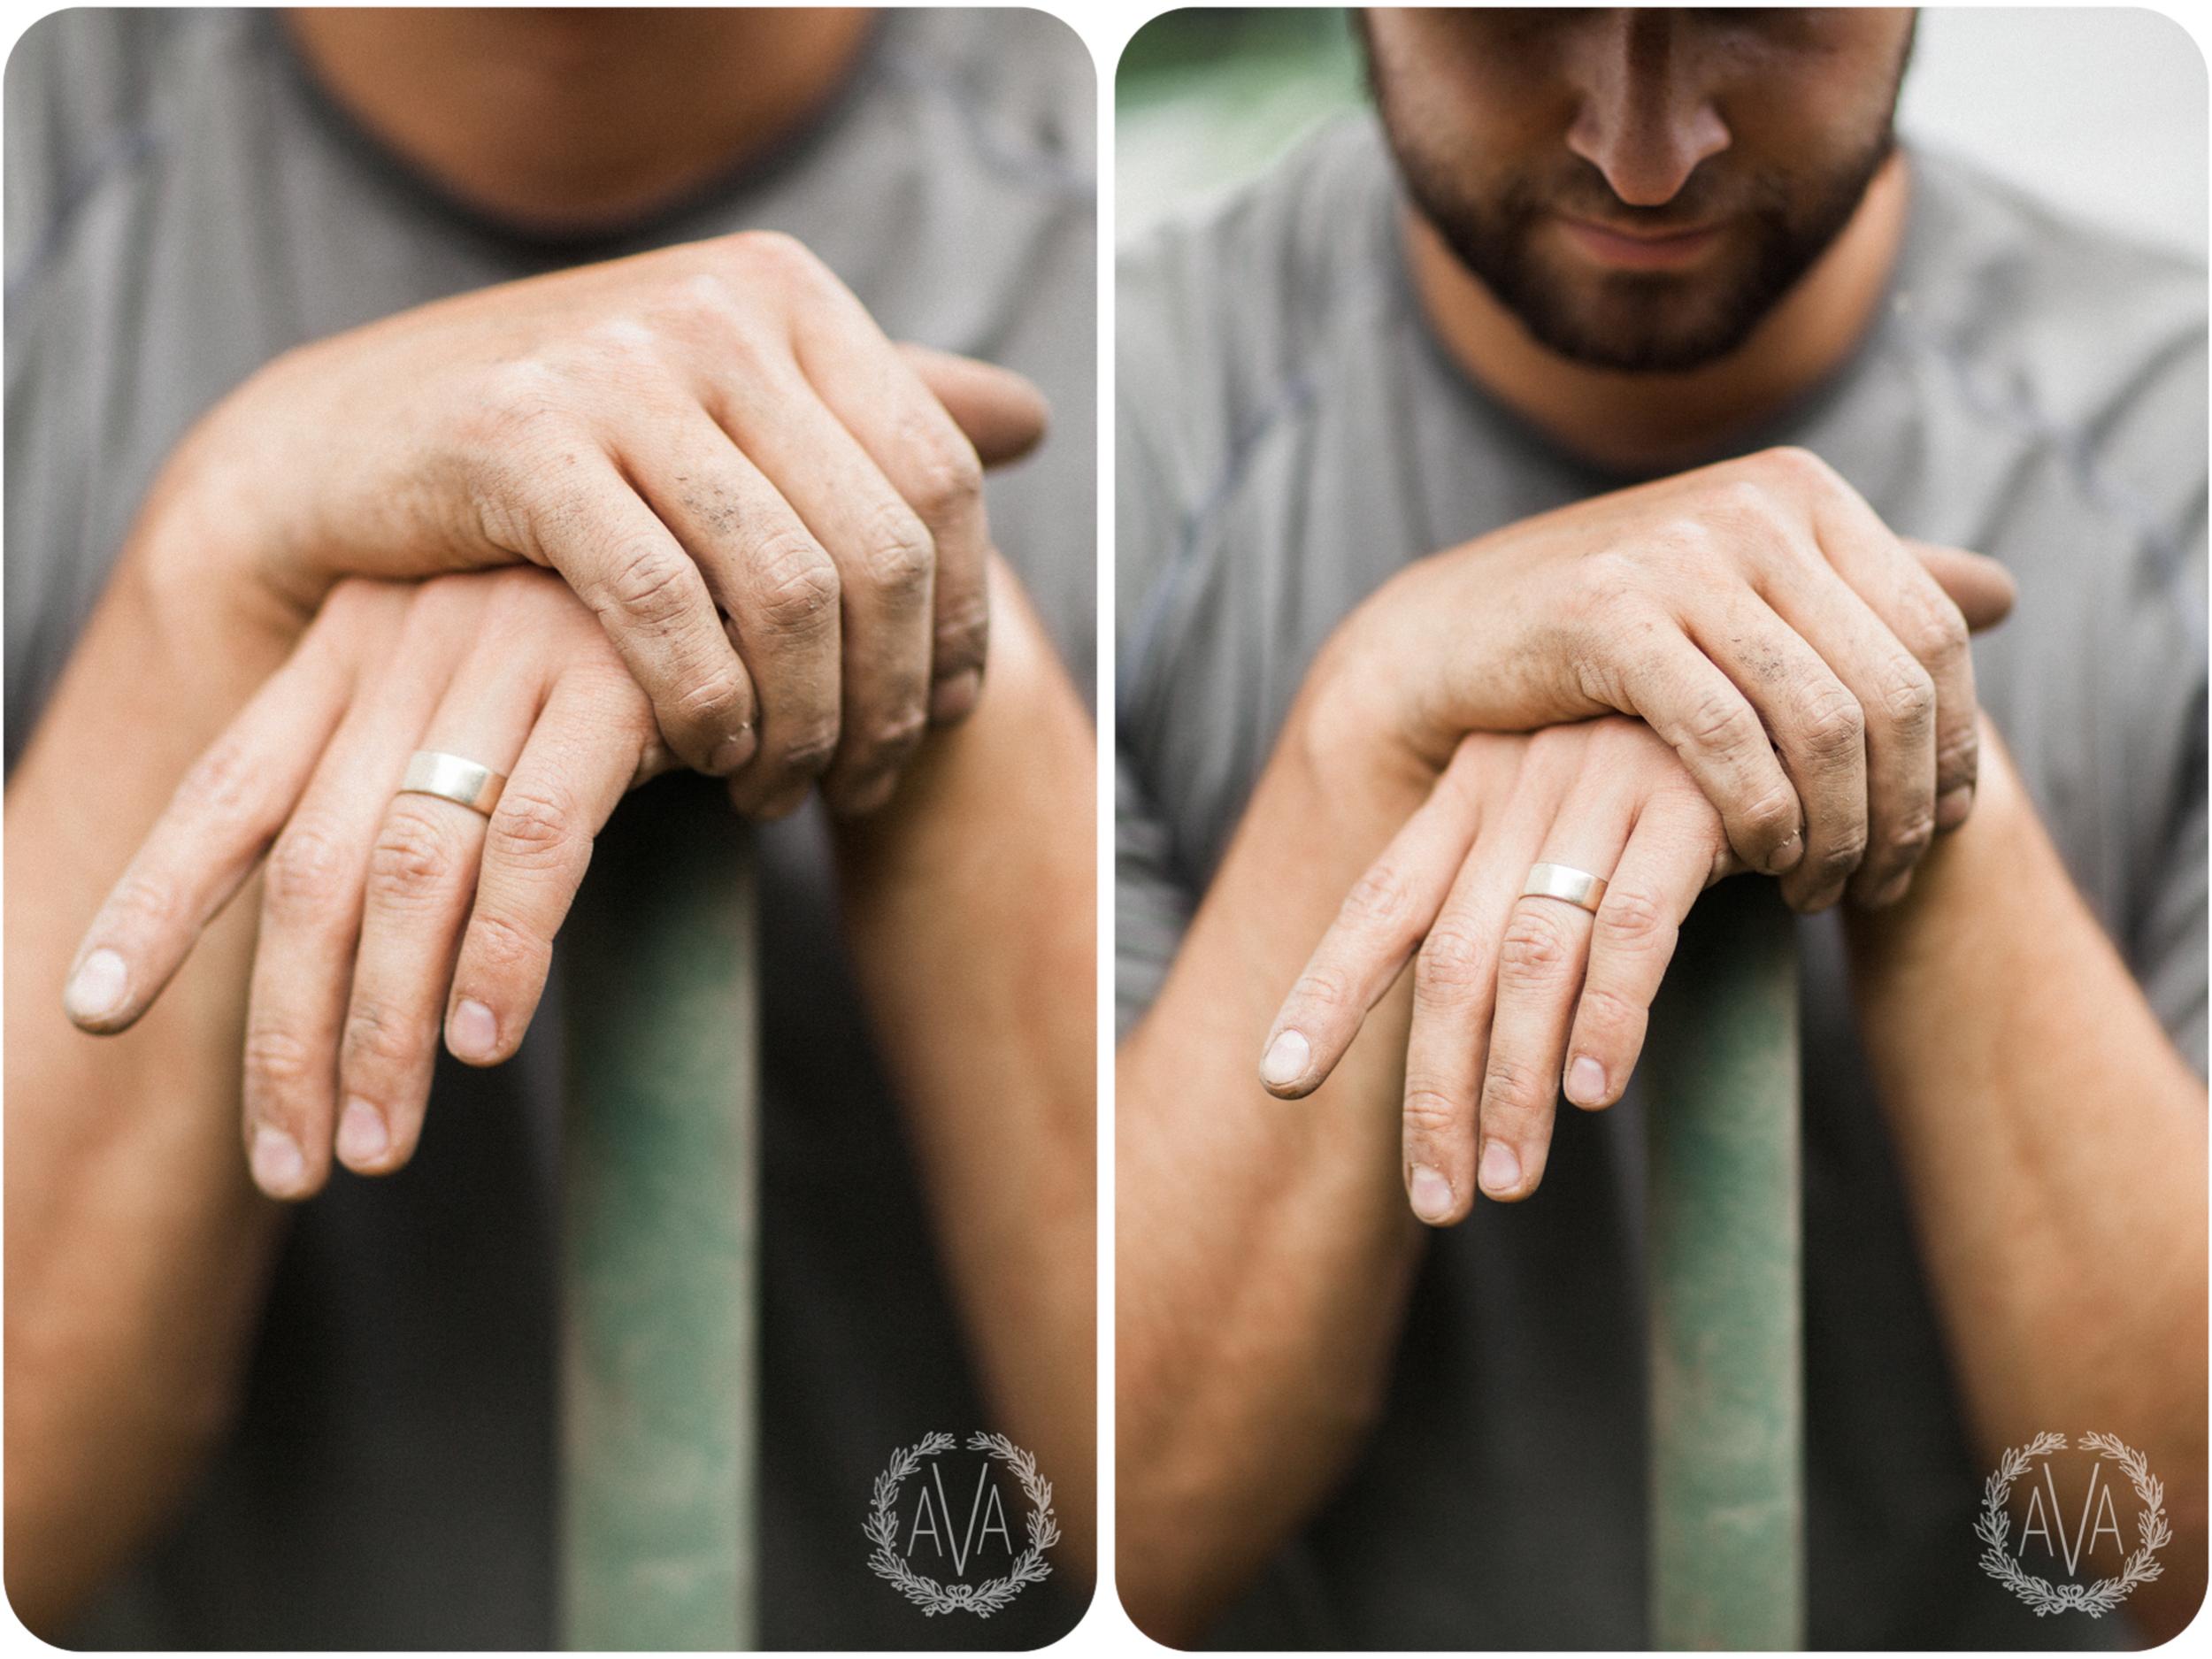 ava_hands_double_.jpg